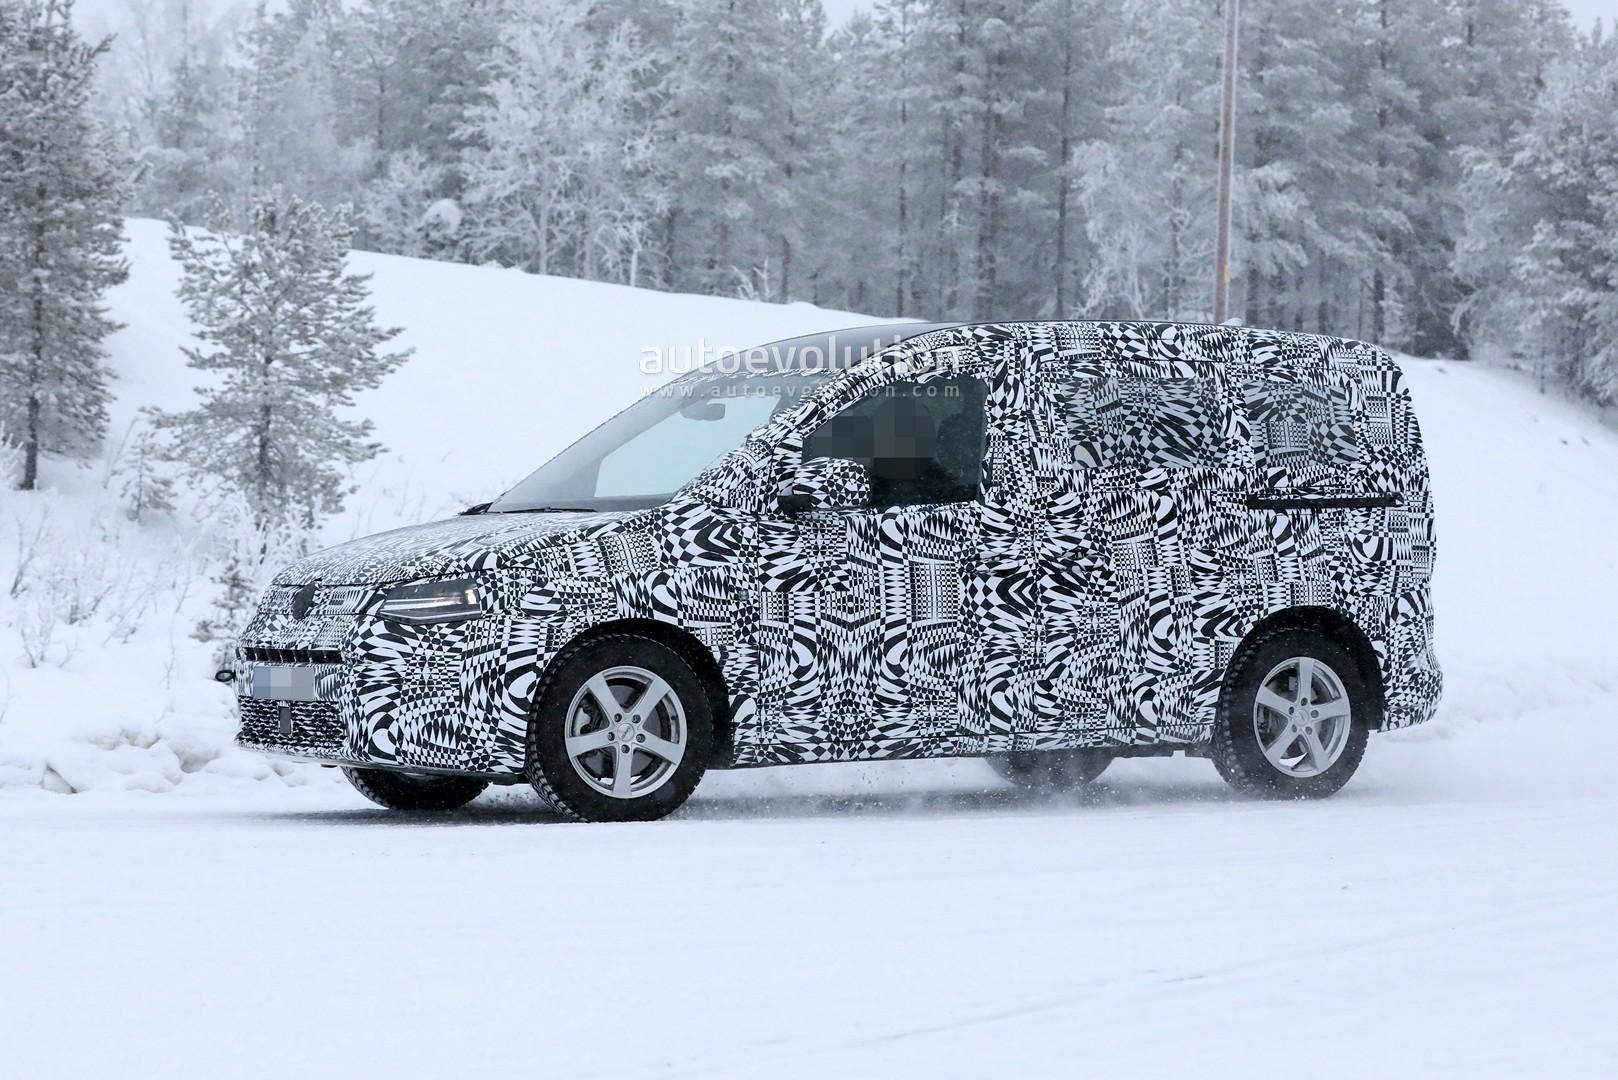 2021 VW Caddy Is Bringing MQB Hybrid Tech, Has Audi RS6 ...